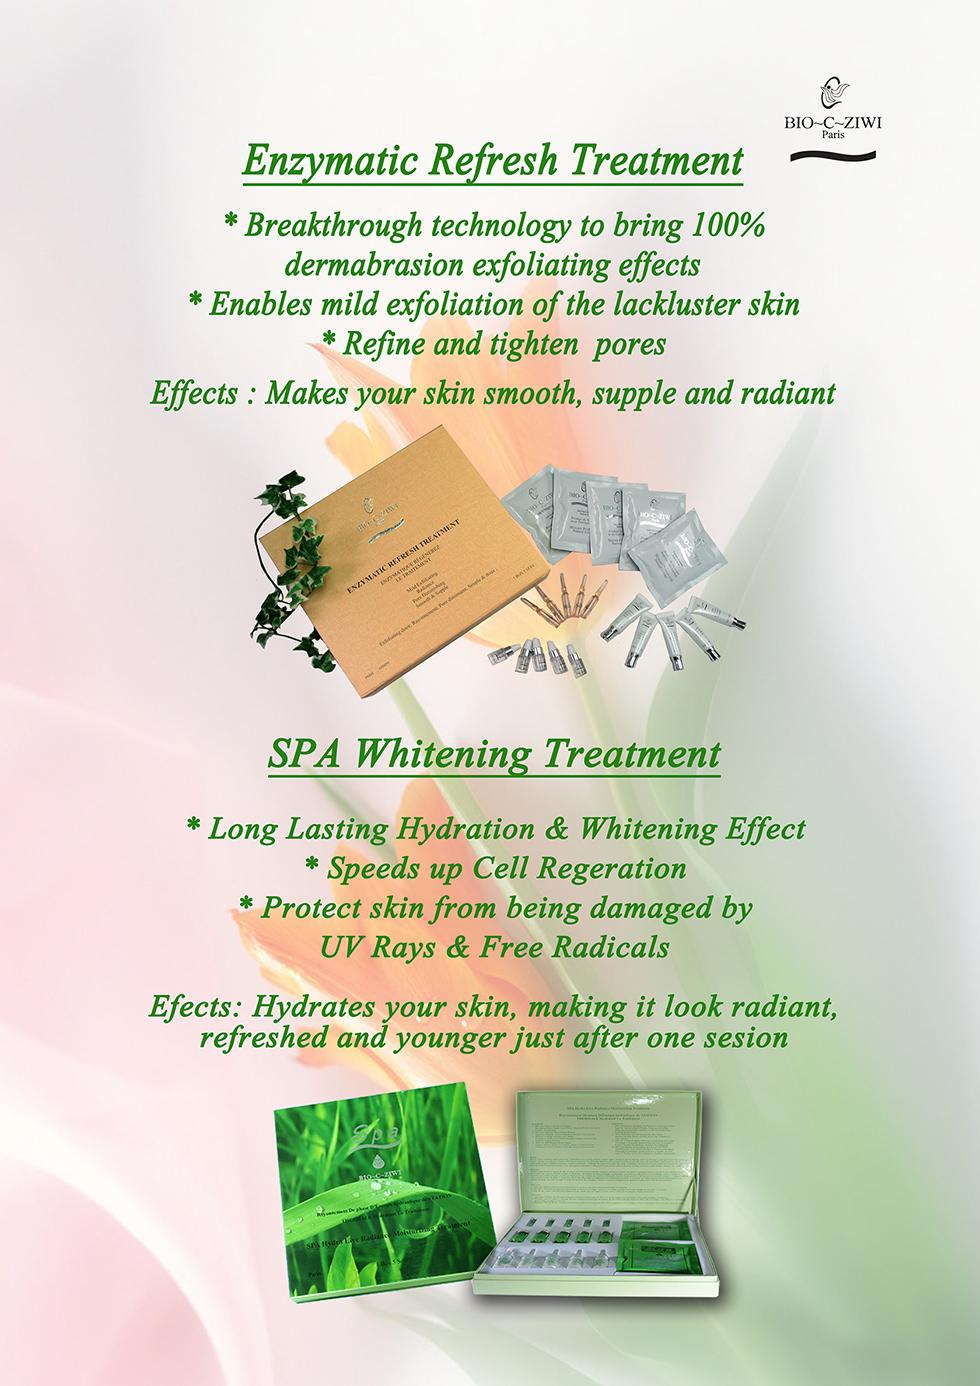 Enzymatic & Spa-Whitening-Treatment